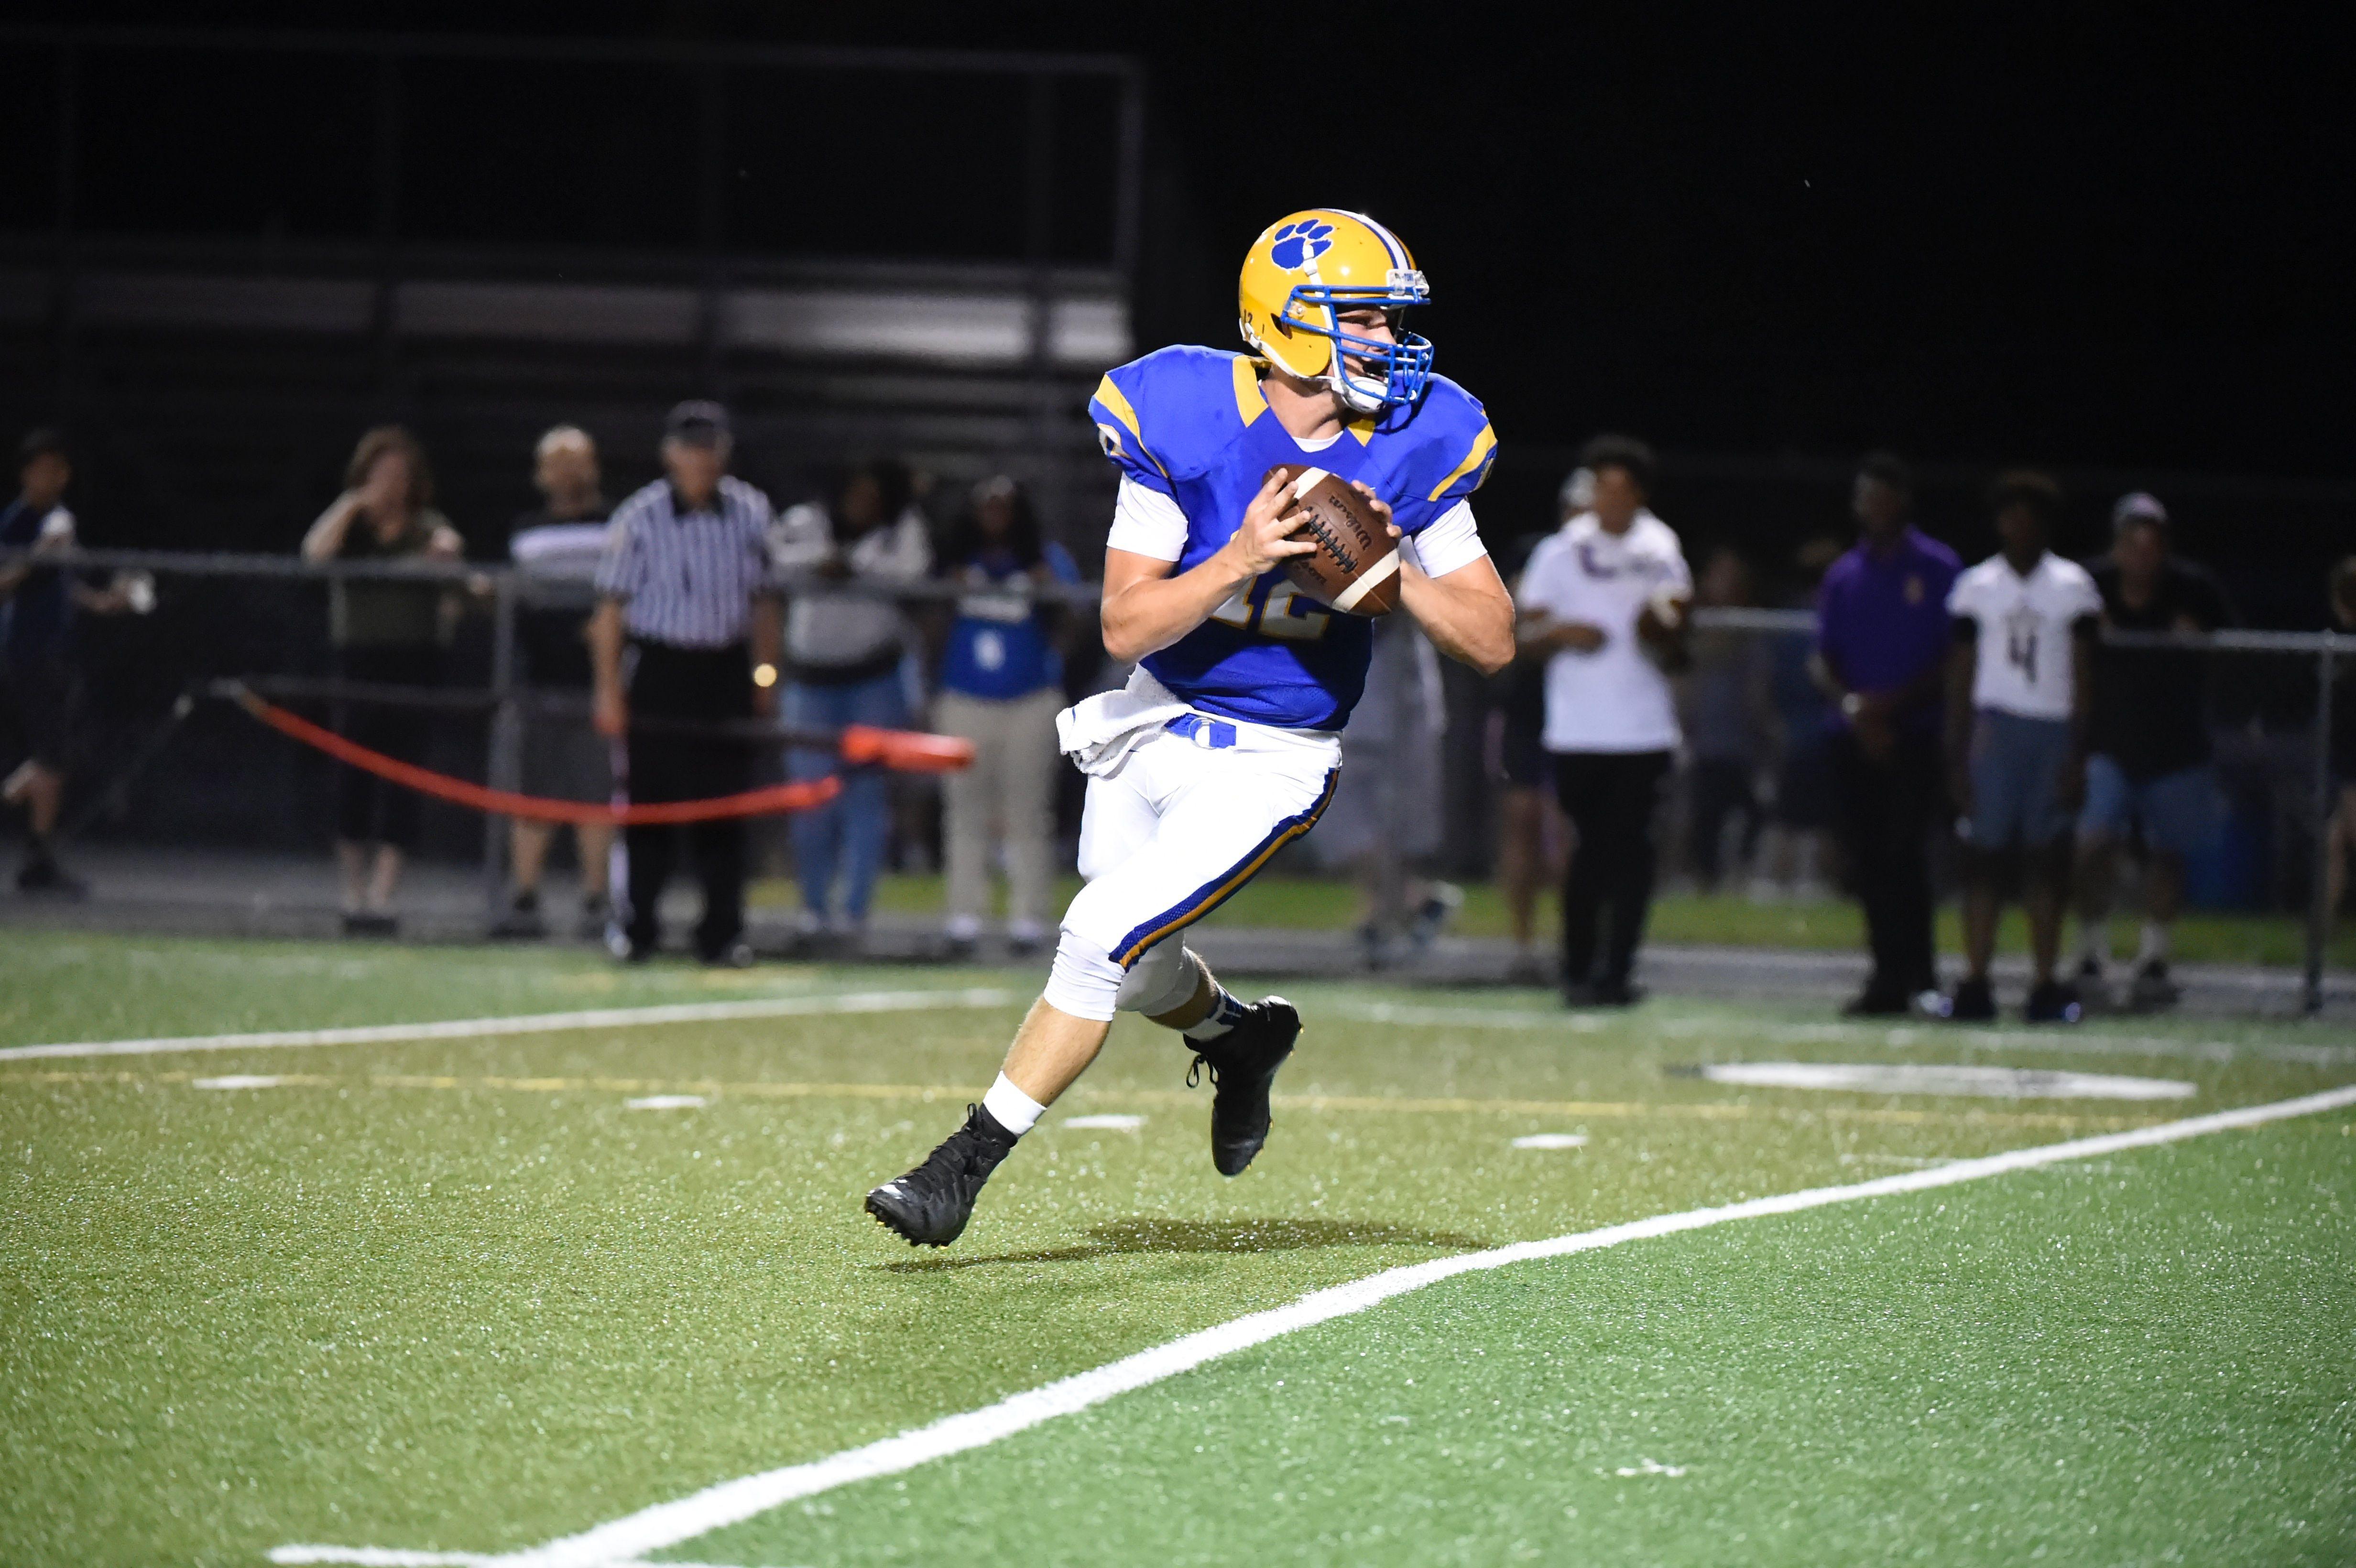 Downingtown East senior quarterback Luke Davis did not play last season due to a broken collarbone.